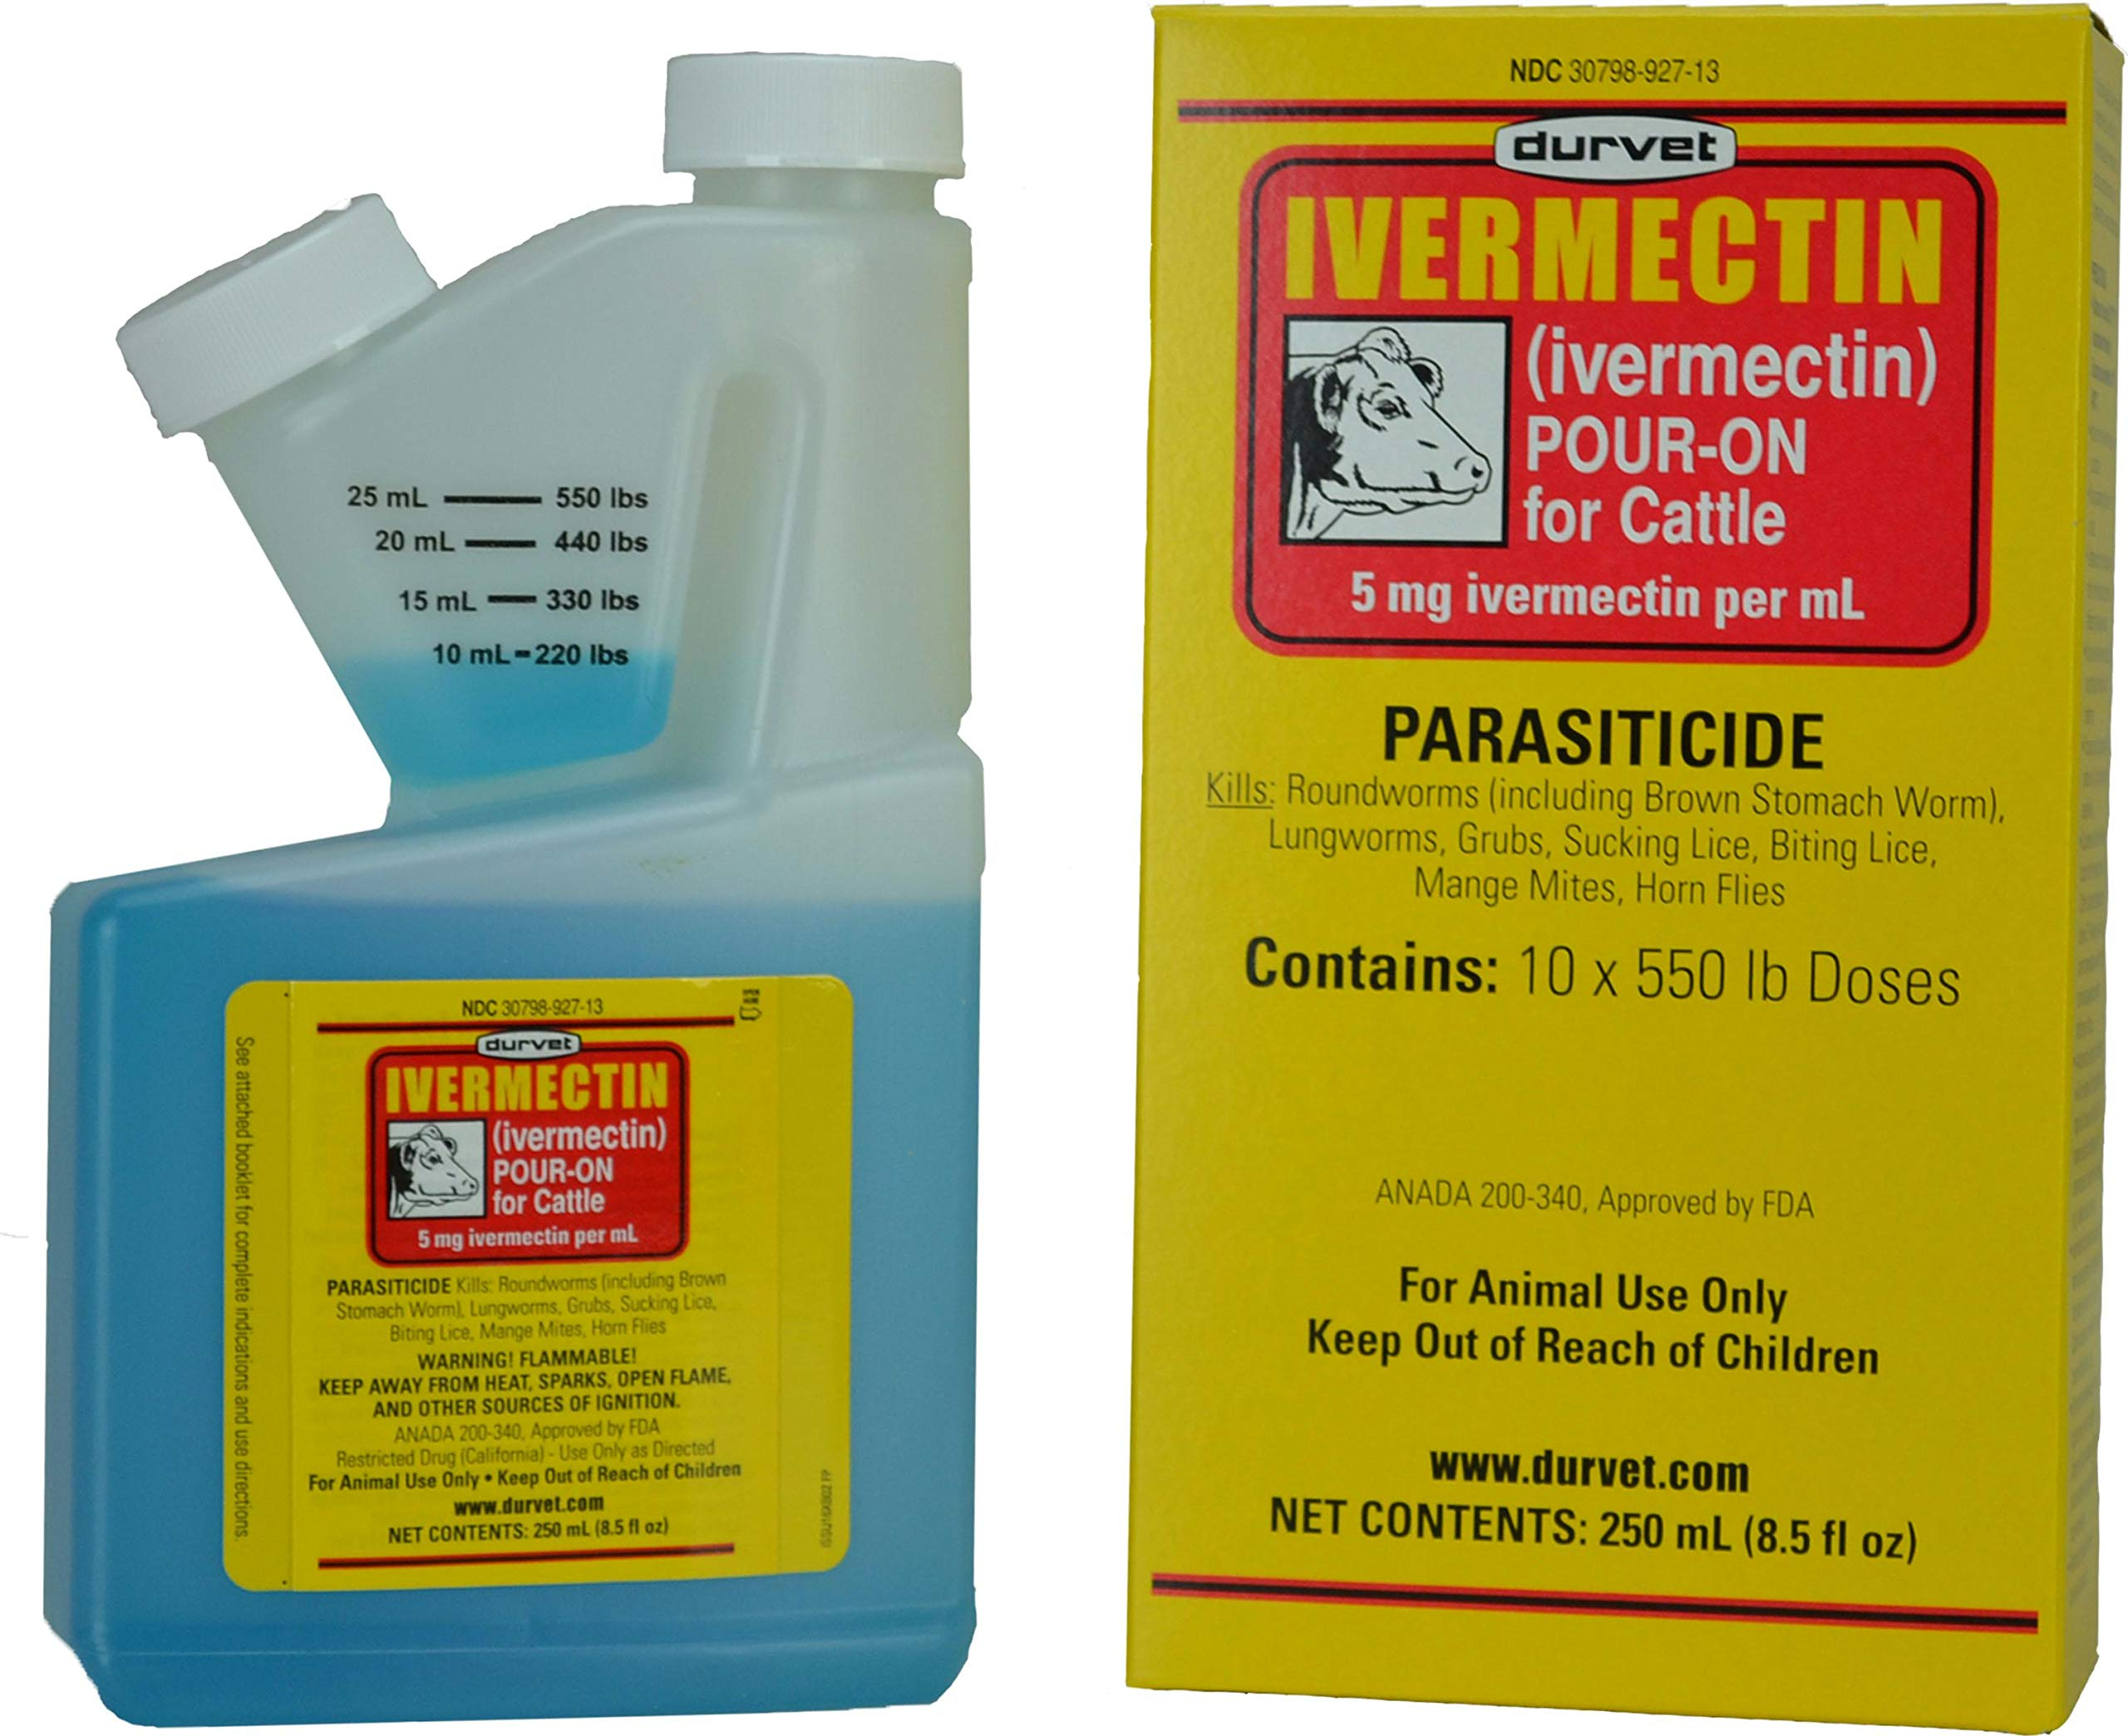 Durvet Ivermectin Pour On Dewormer 250mL